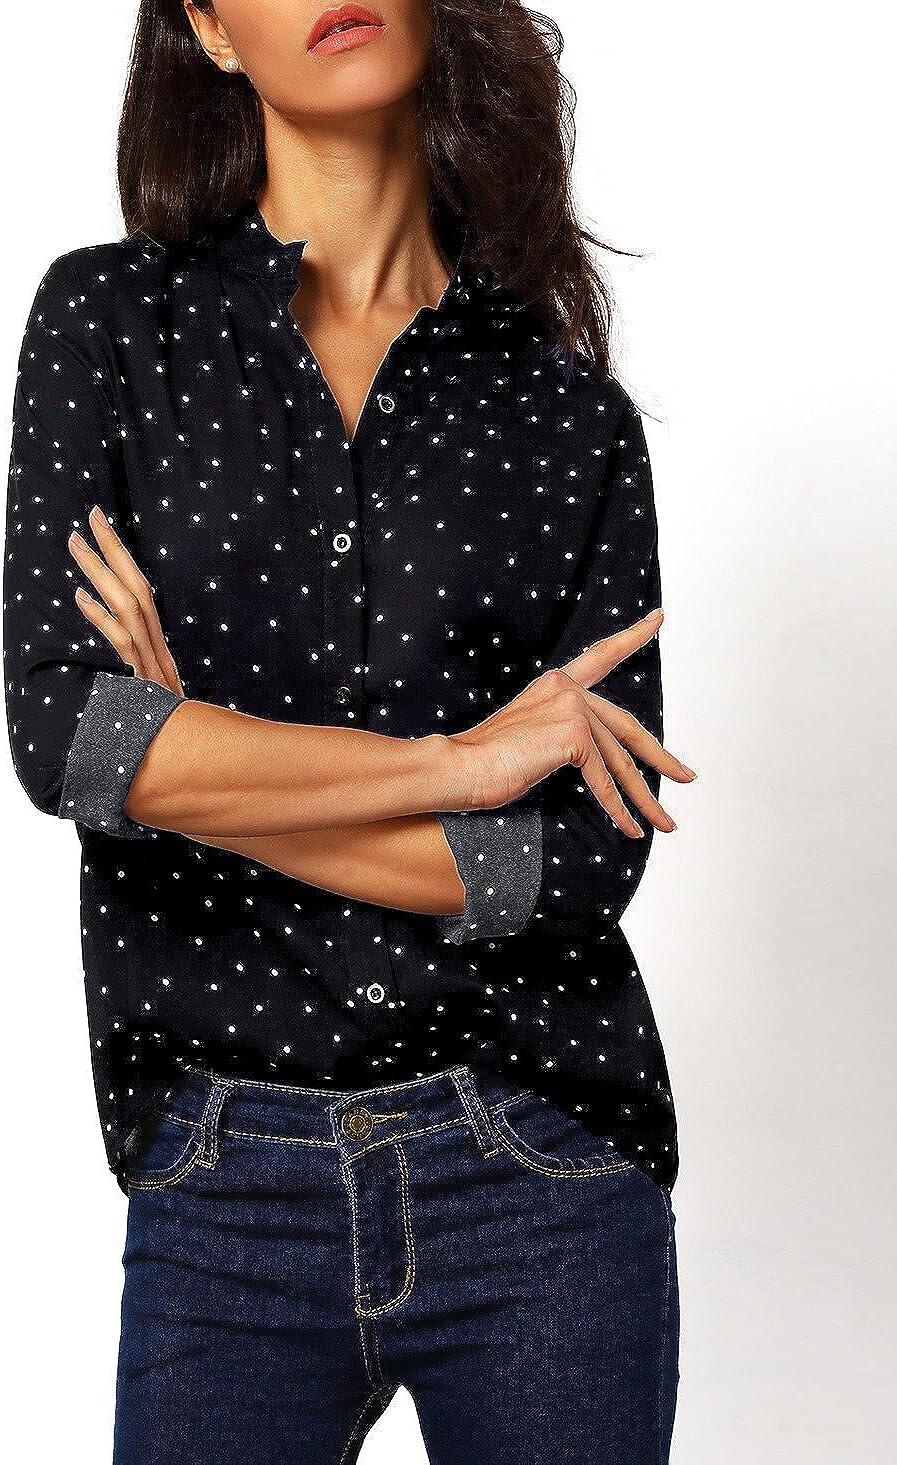 Floerns Women's Long Sleeve Tops Print Button Down Office Blouse Shirts